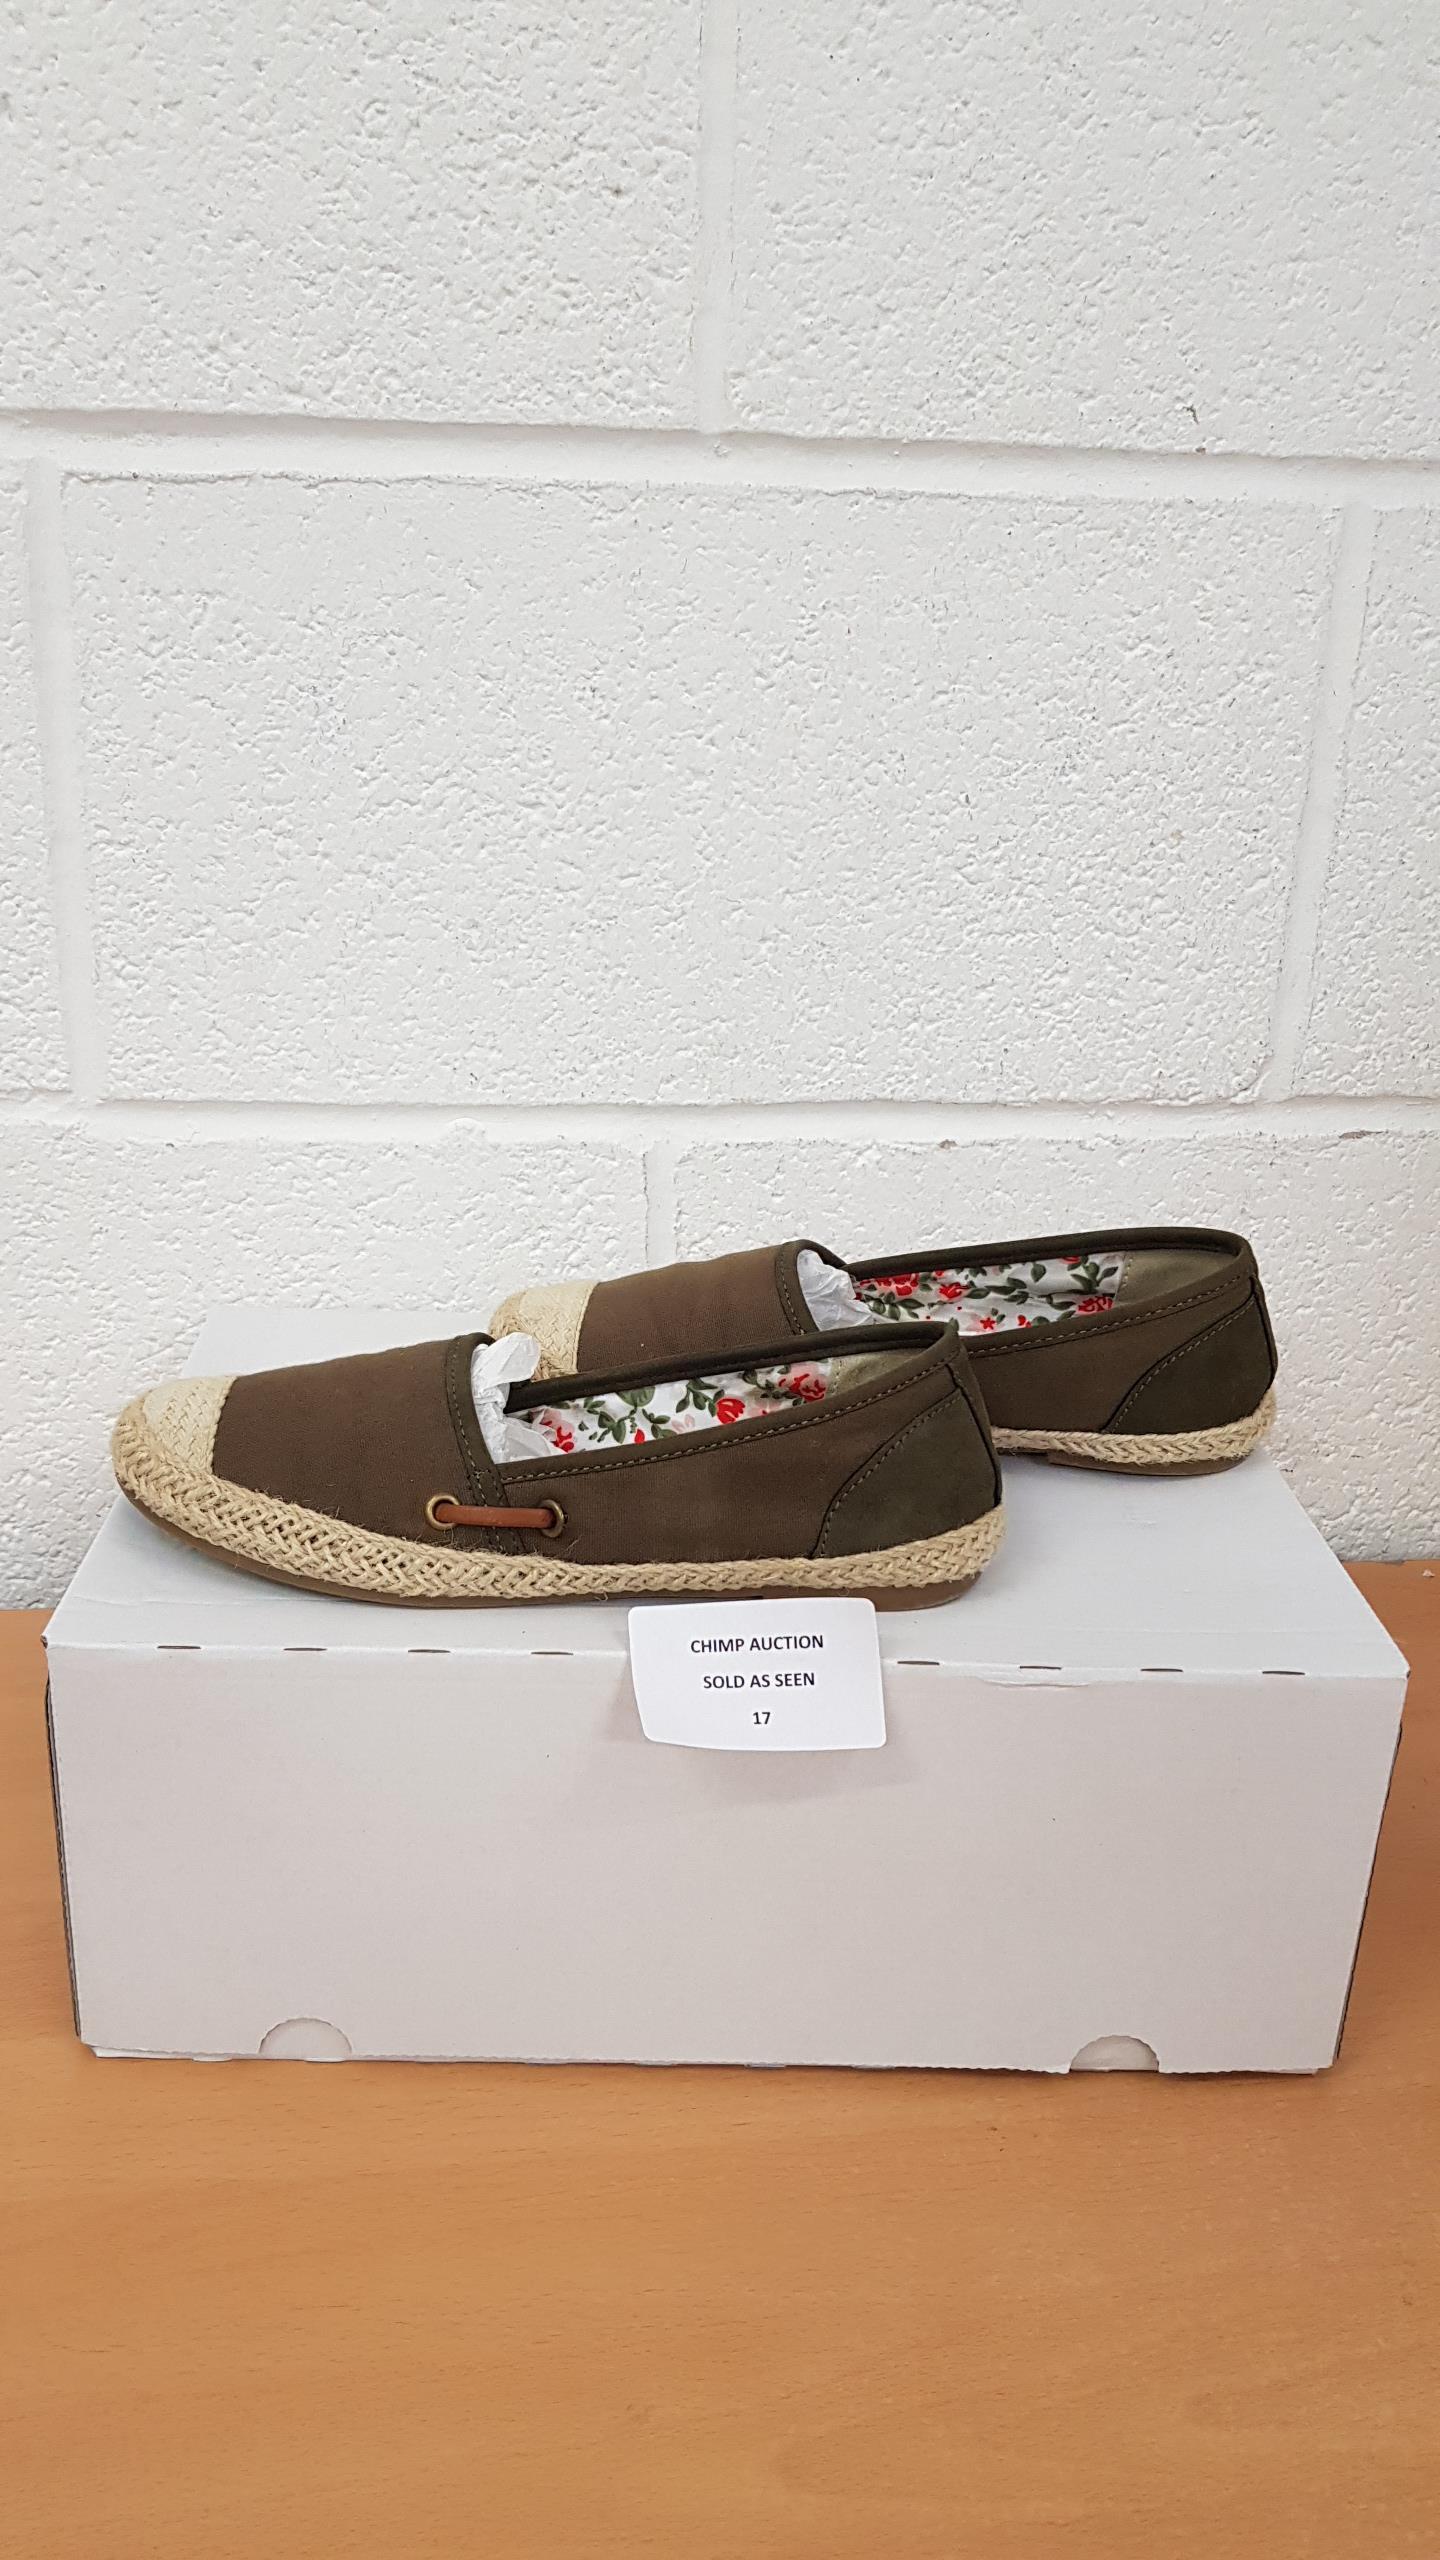 Lot 17 - Tamaris ladies shoes EU 37